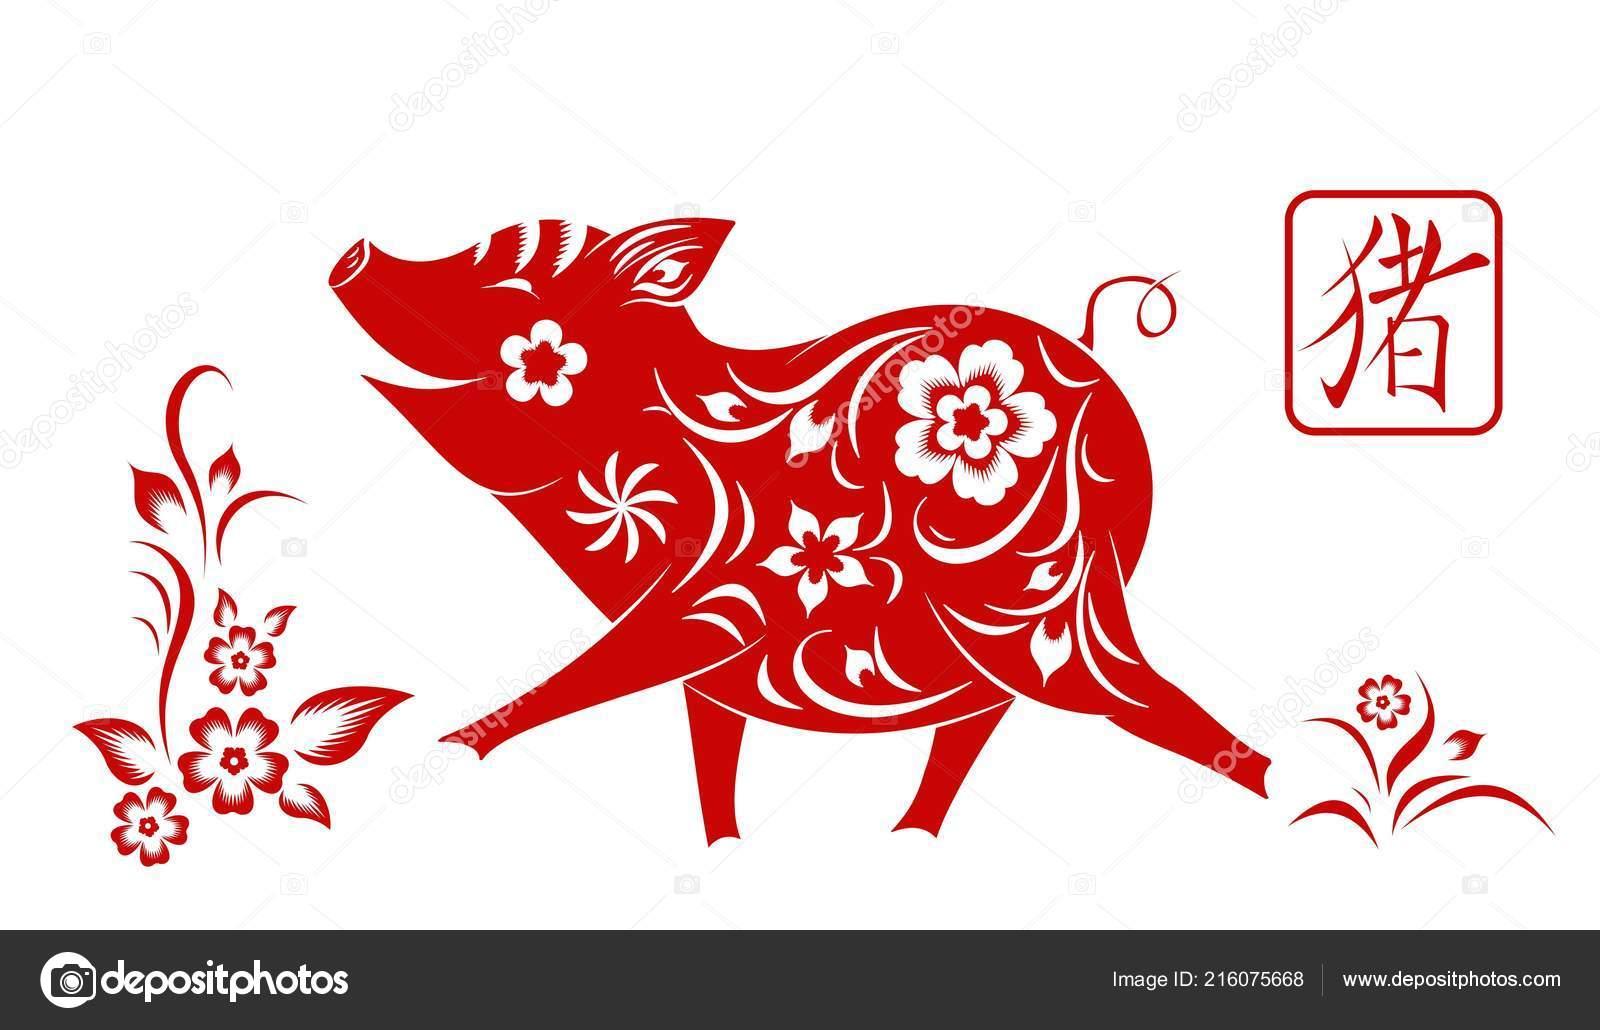 Pig star sign